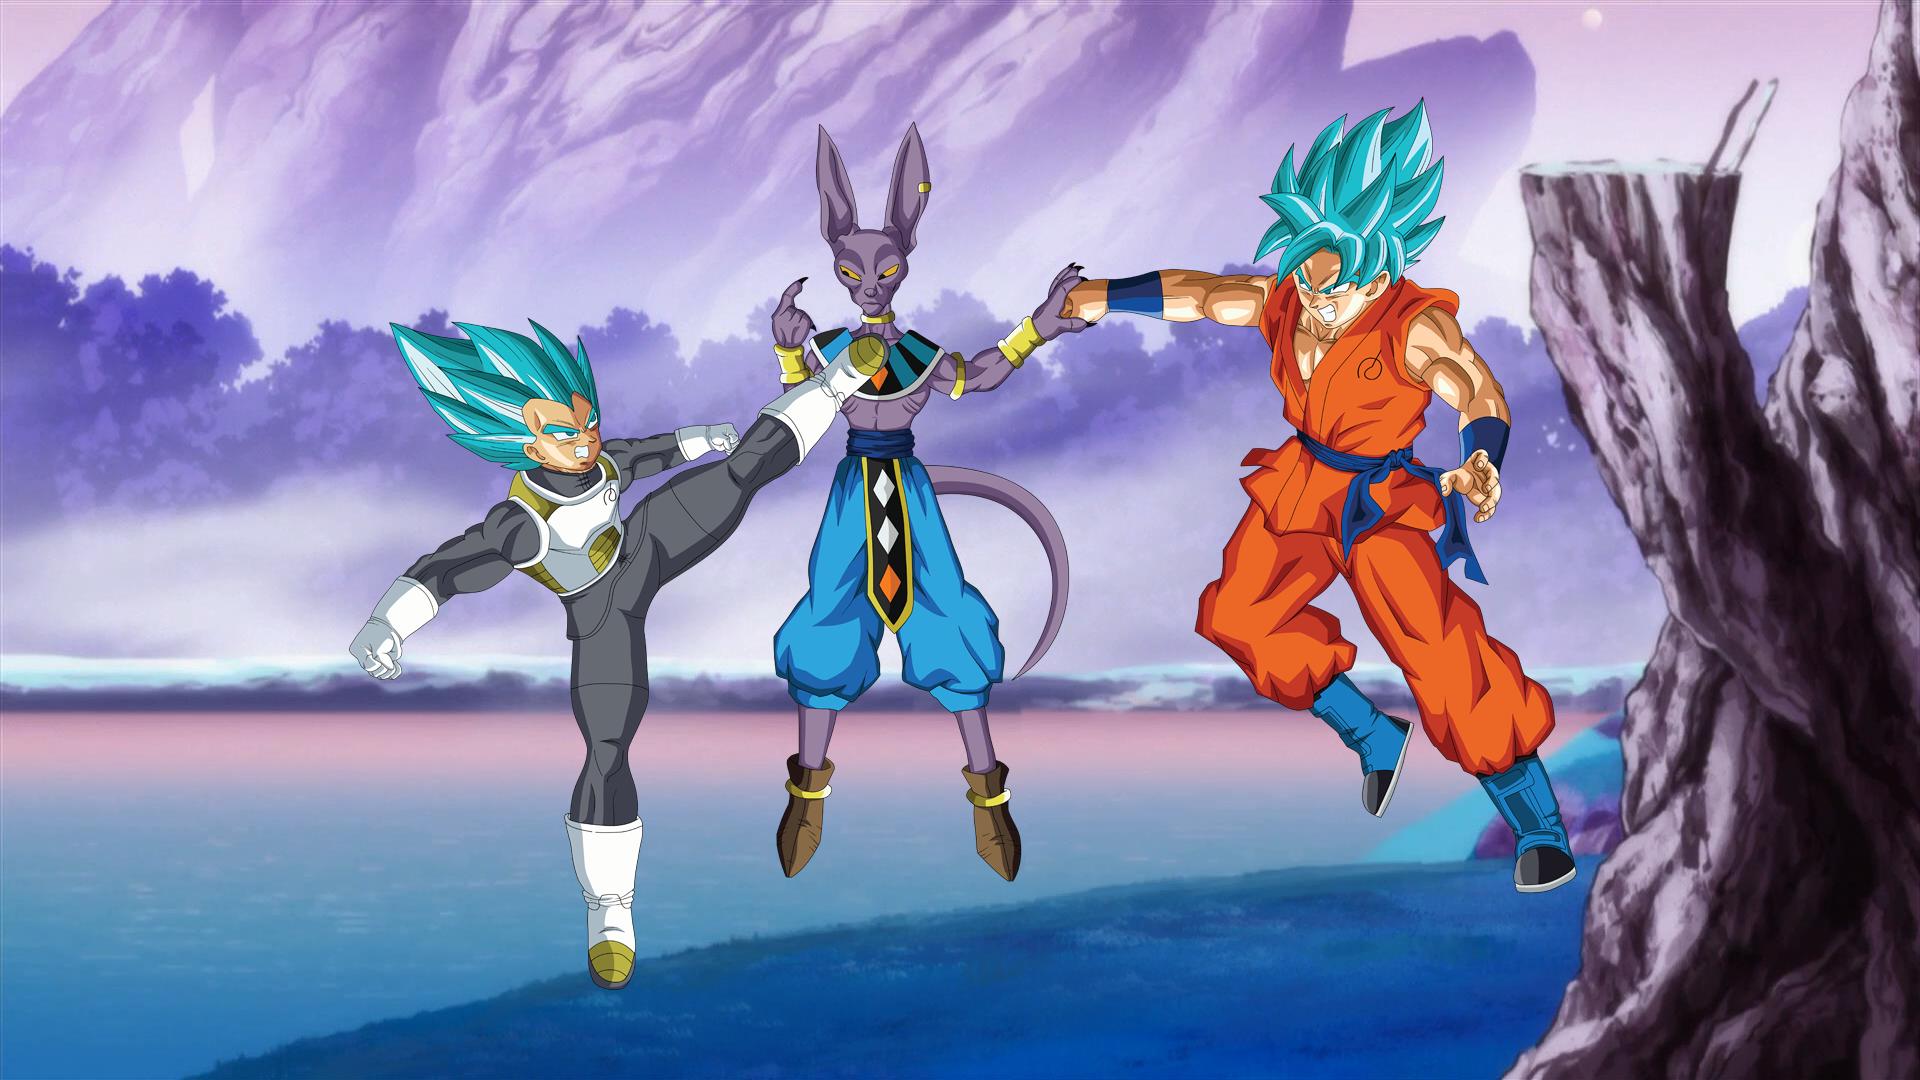 Goku And Vegeta Full Hd Fondo De Pantalla And Fondo De: SSGSS Goku & Vegeta VS Beerus Full HD Fondo De Pantalla